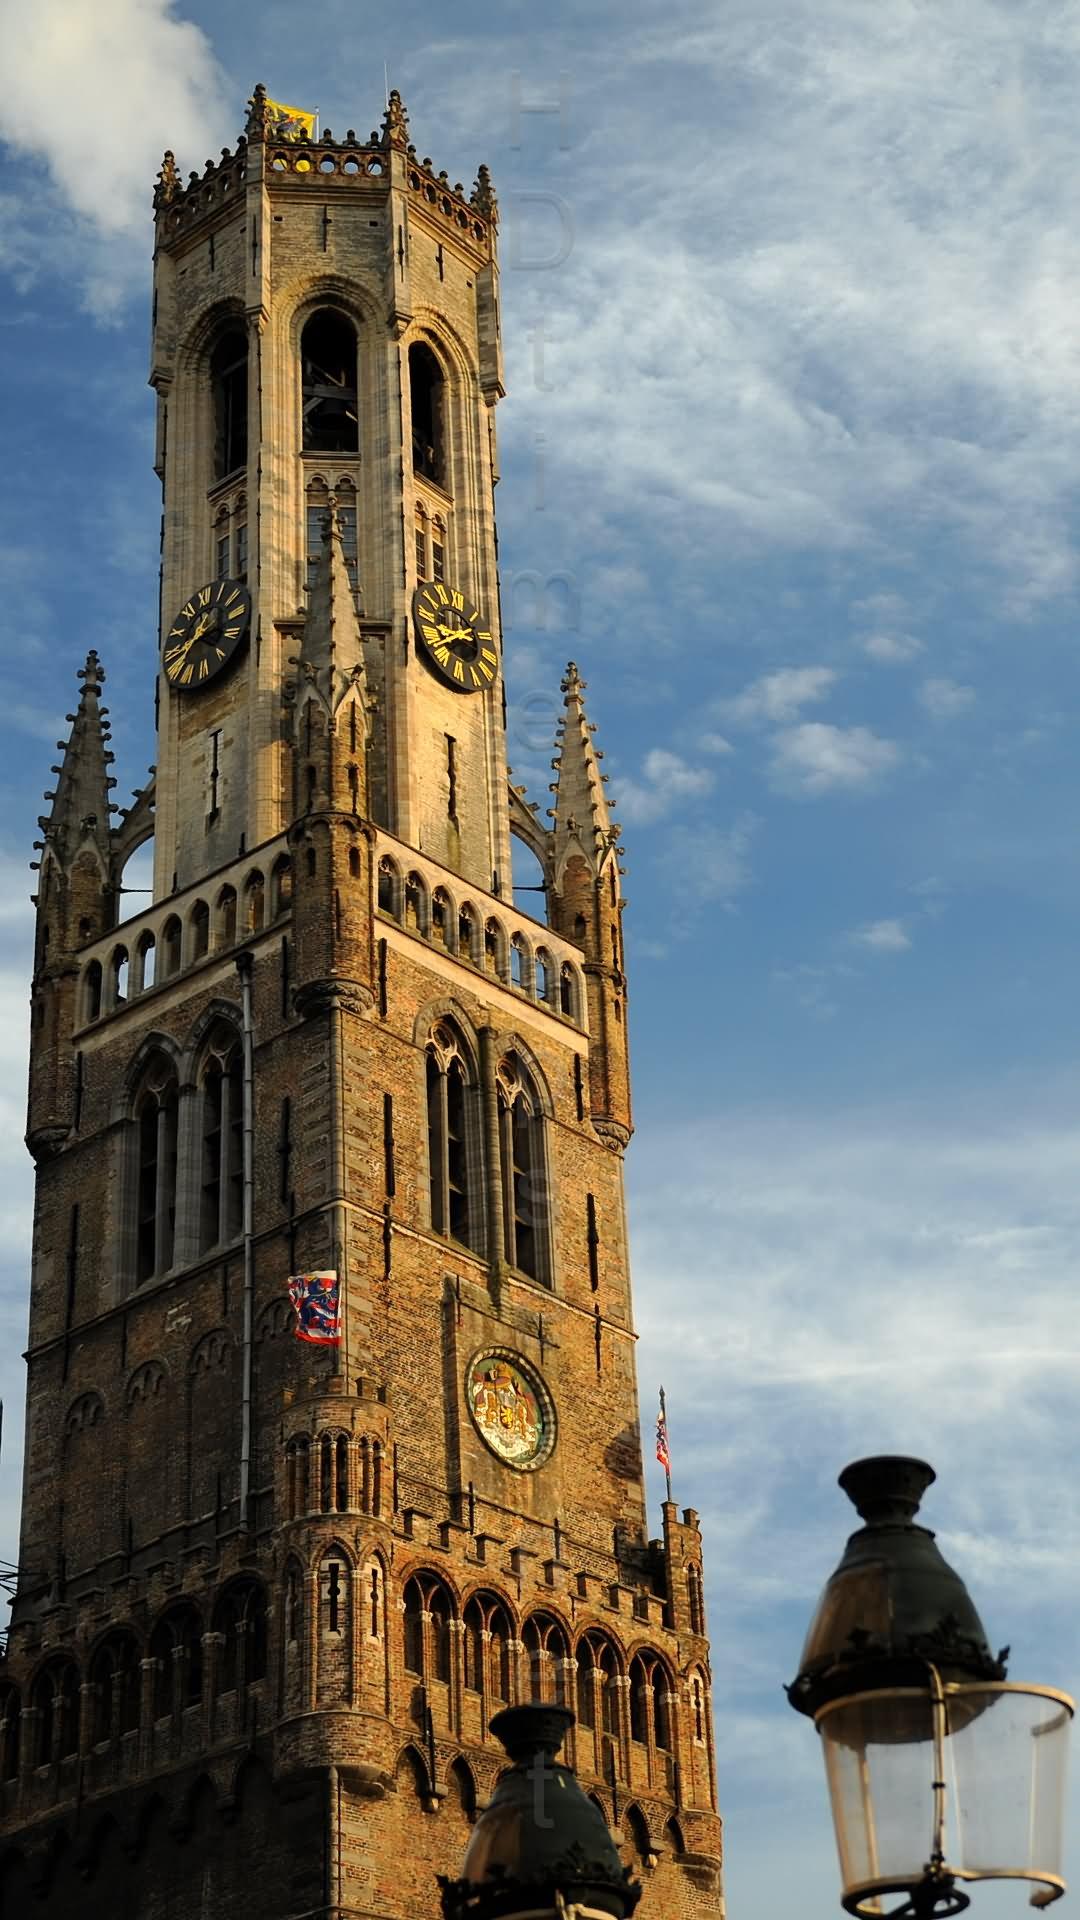 Magnificent View Of The Belfry Of Bruges In Belgium